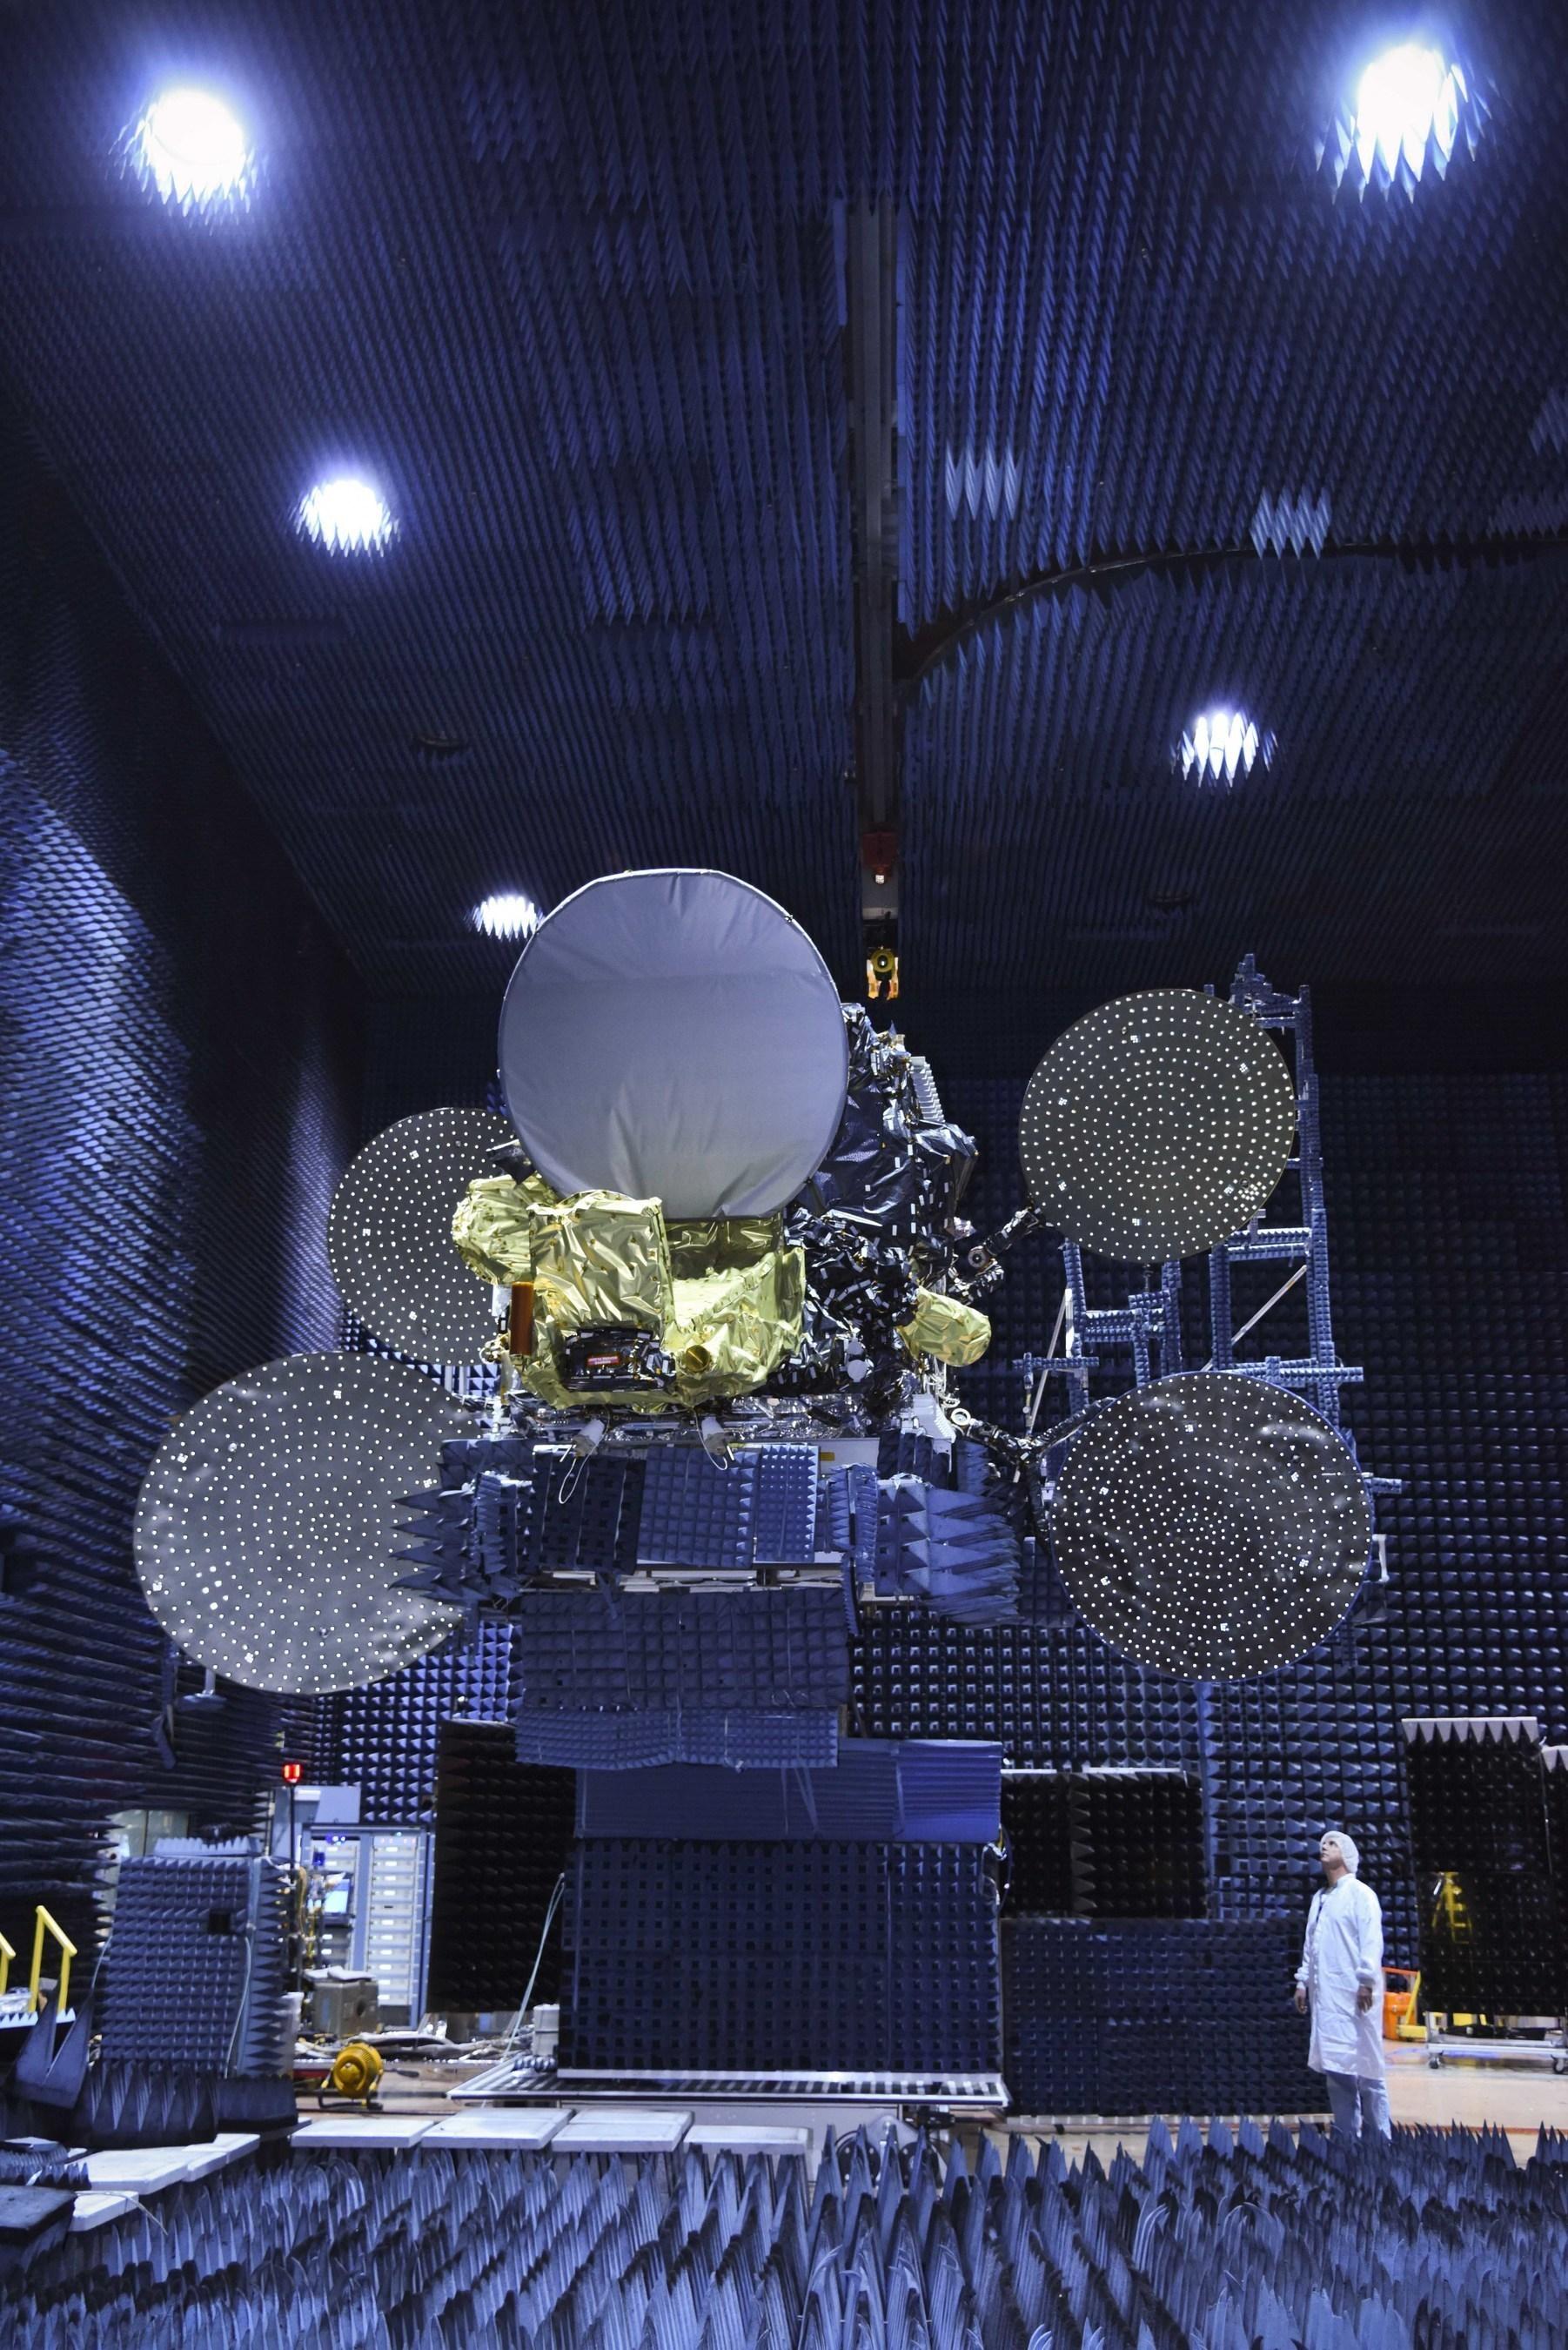 SSL delivers Eutelsat's advanced Latin America satellite to launch base